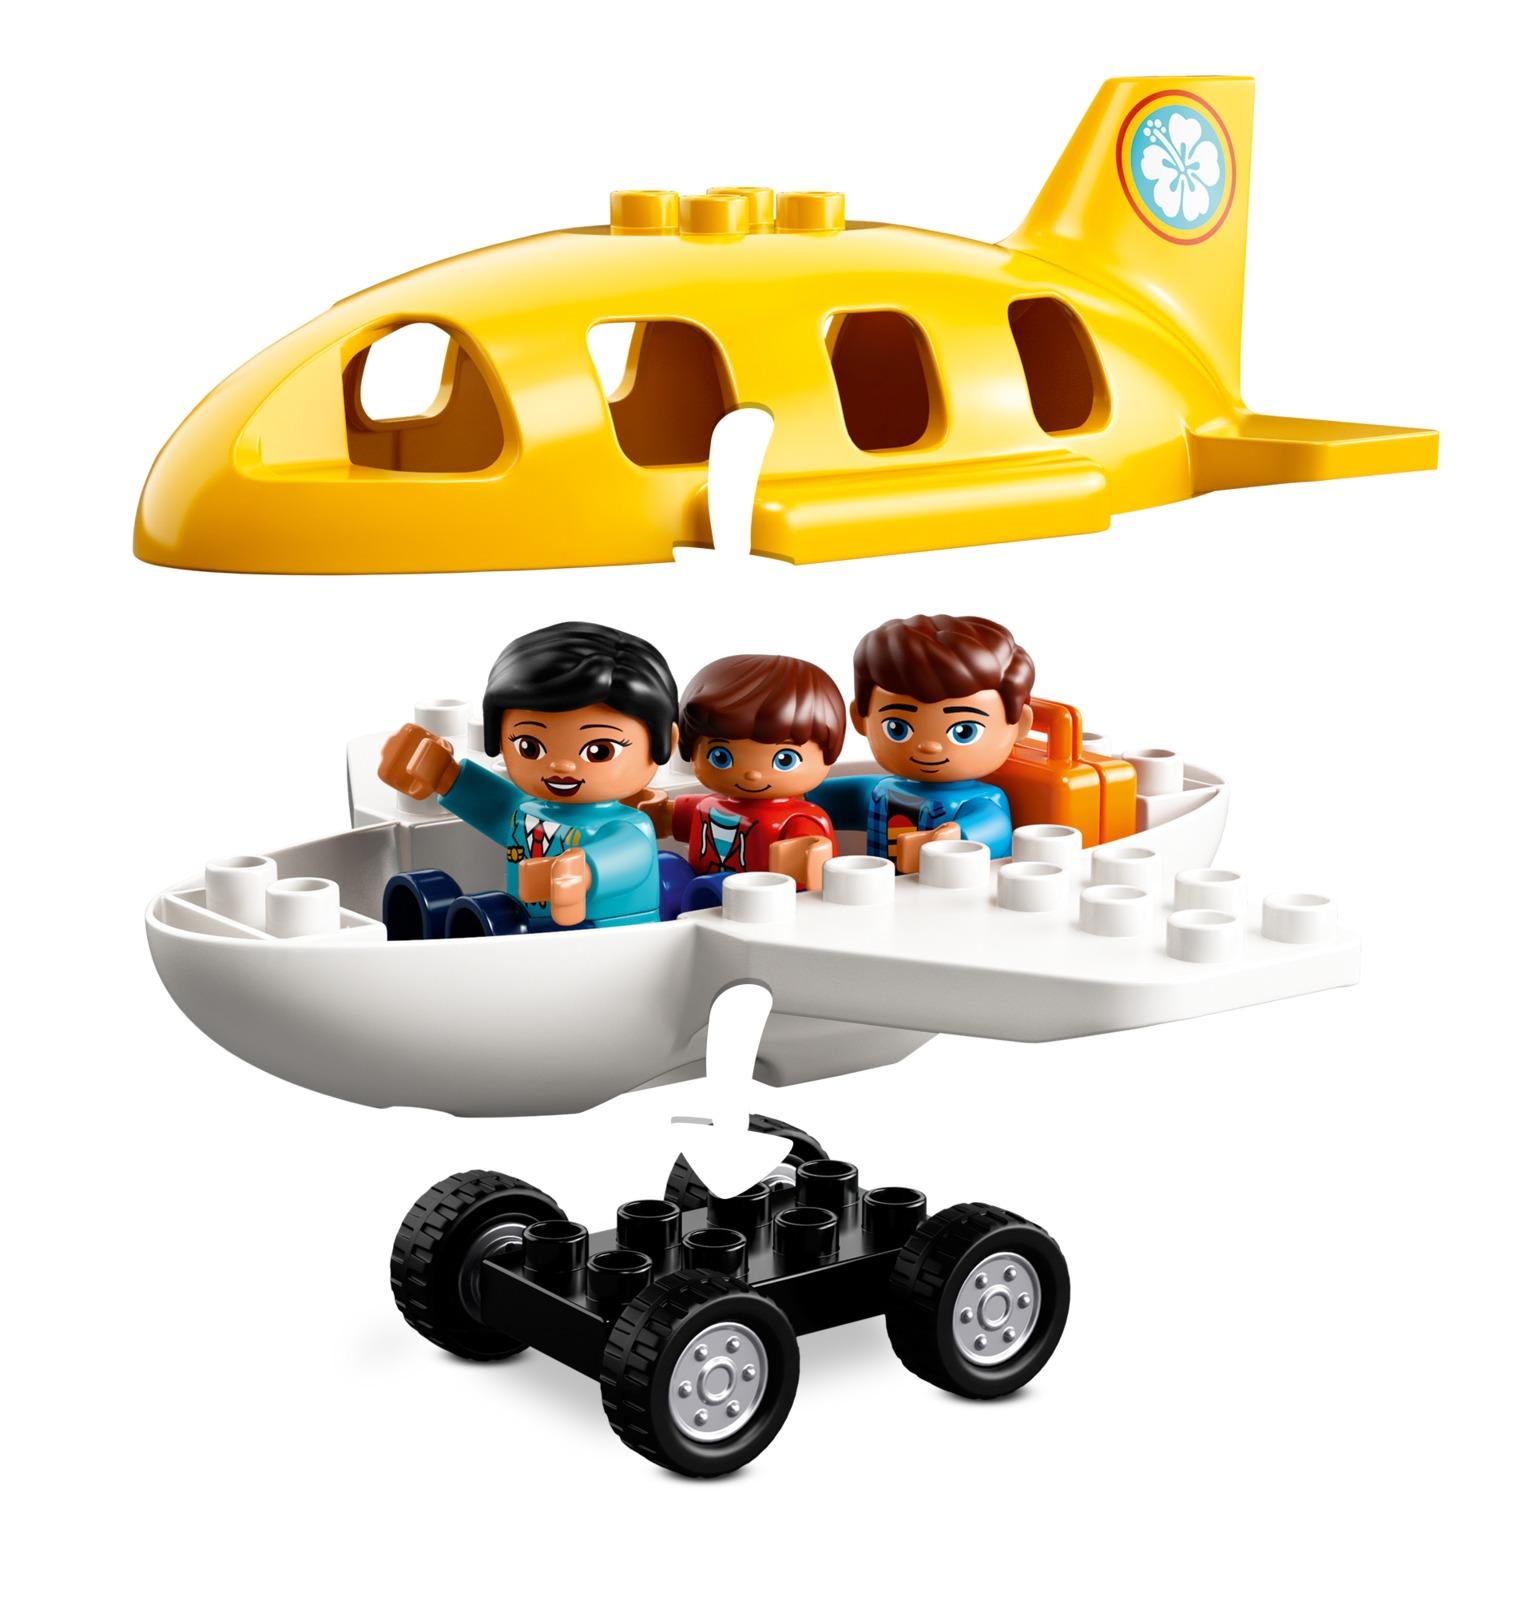 LEGO DUPLO: Airport (10871) image